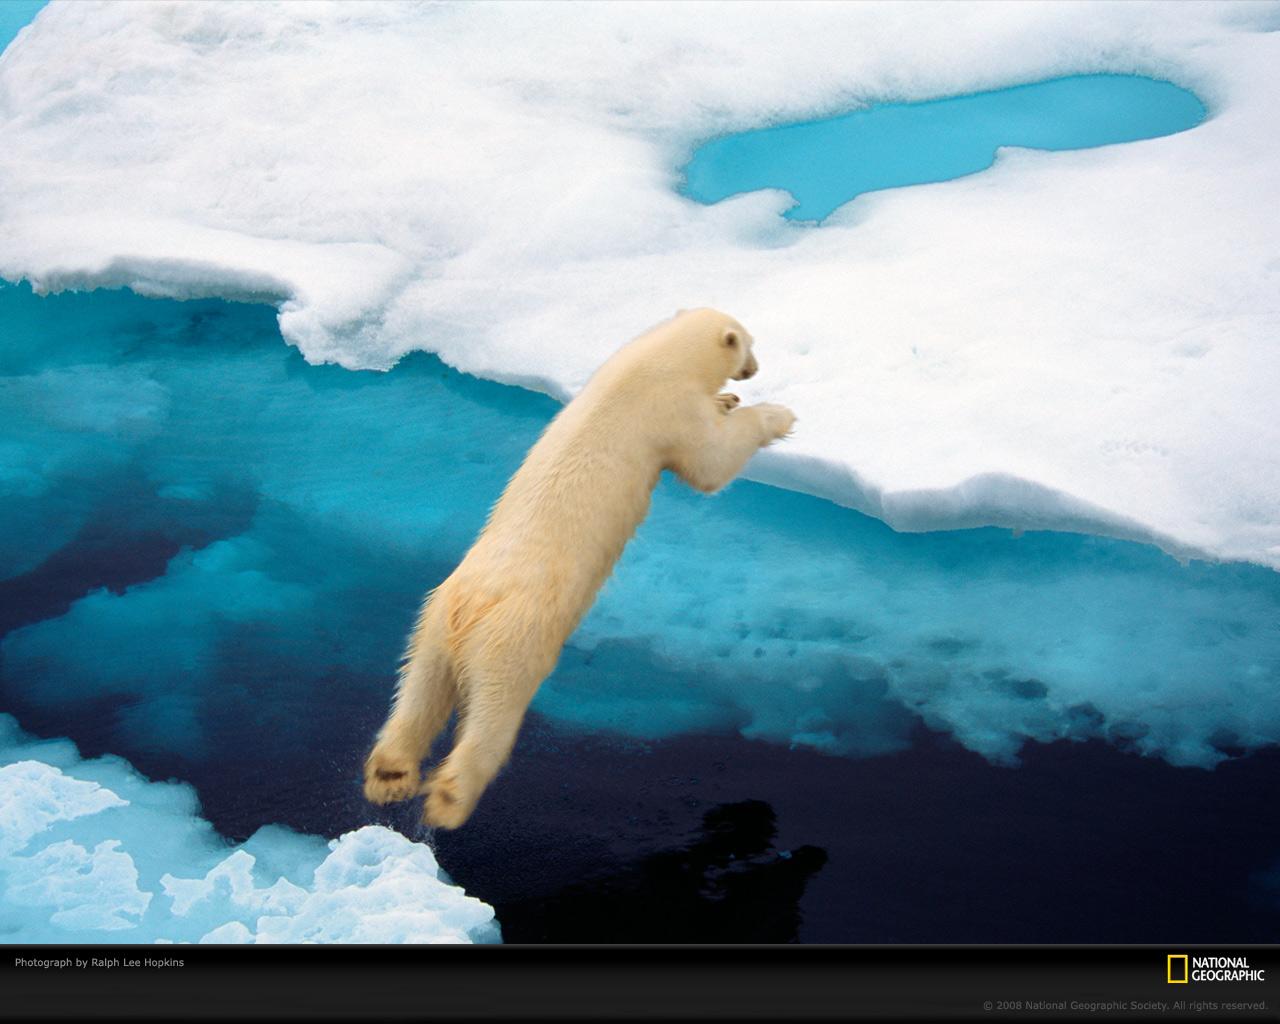 http://2.bp.blogspot.com/_l8xBXJpQwuc/TVE_5qsDW3I/AAAAAAAAAAg/doQW0pIyvOc/s1600/blue-polar-bear-wallpaper.jpg